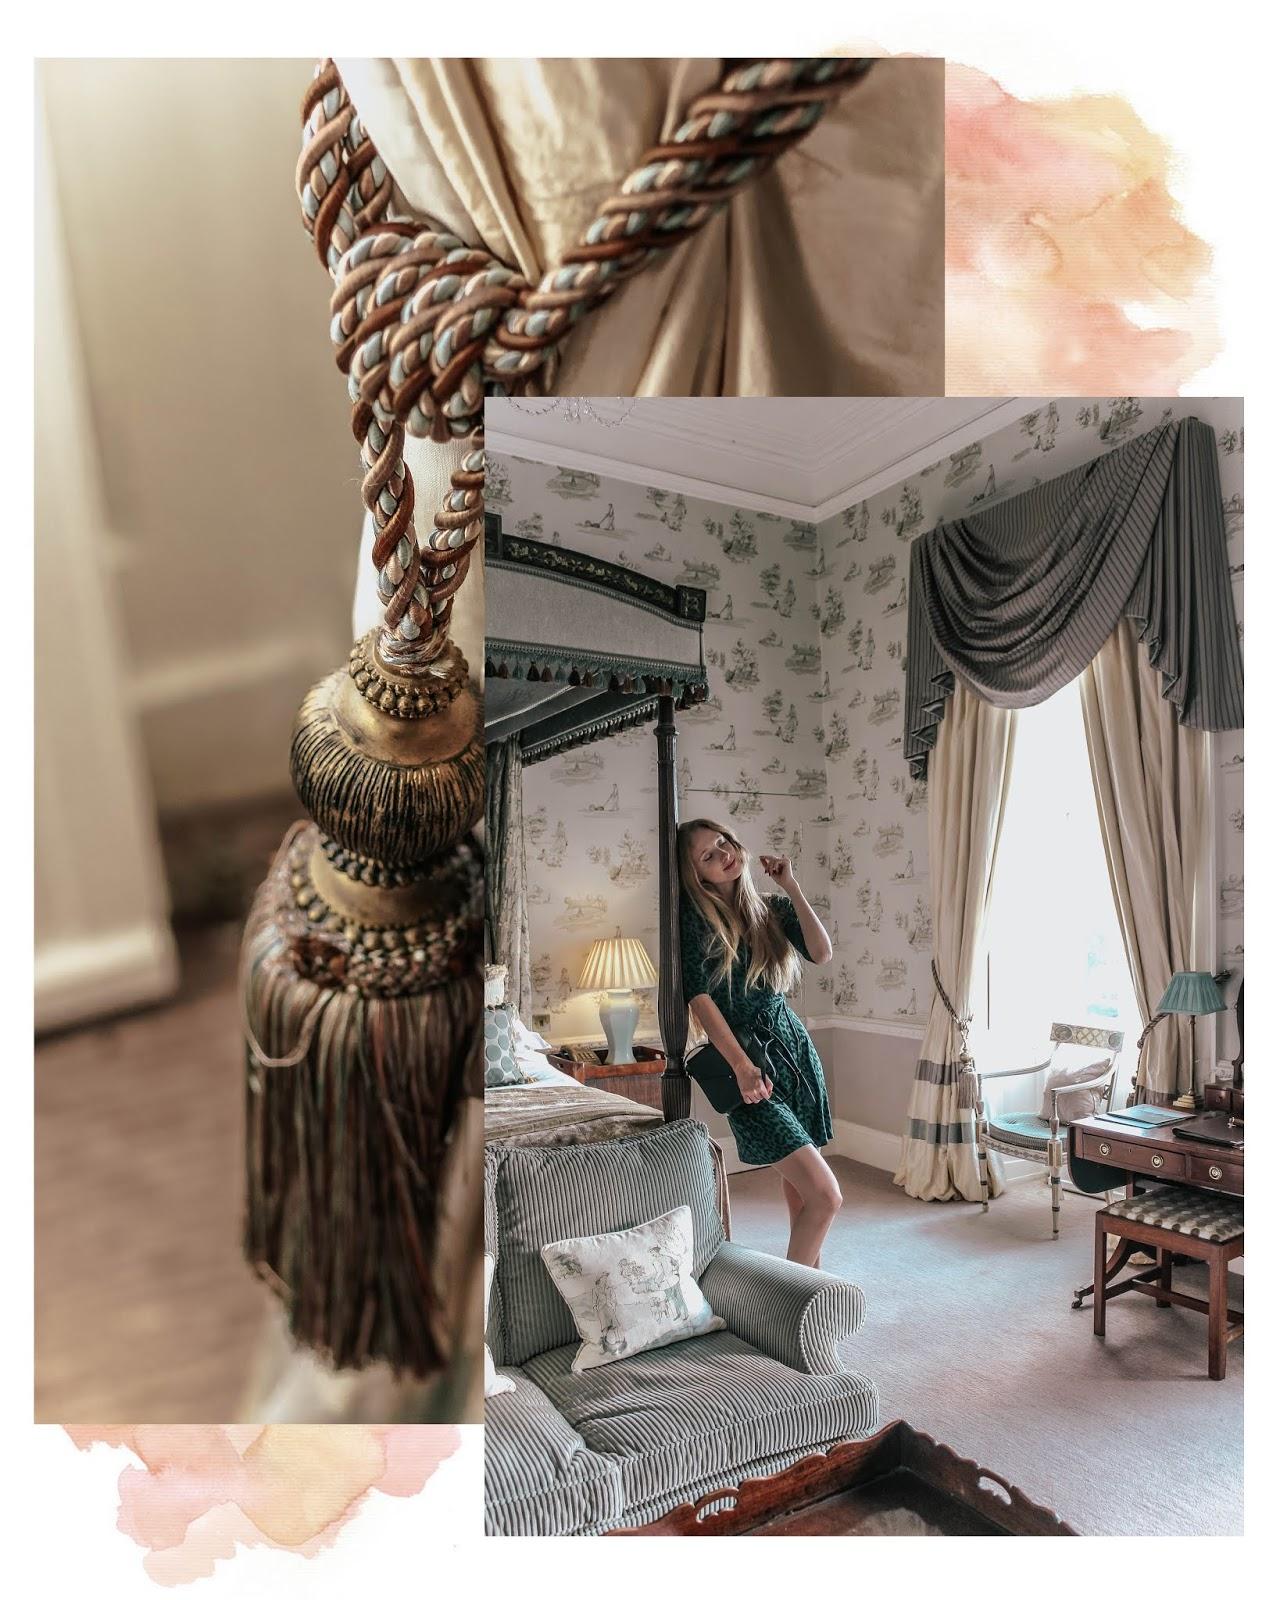 Ston Waston Park Hotel Fashion Blog Photoshoot